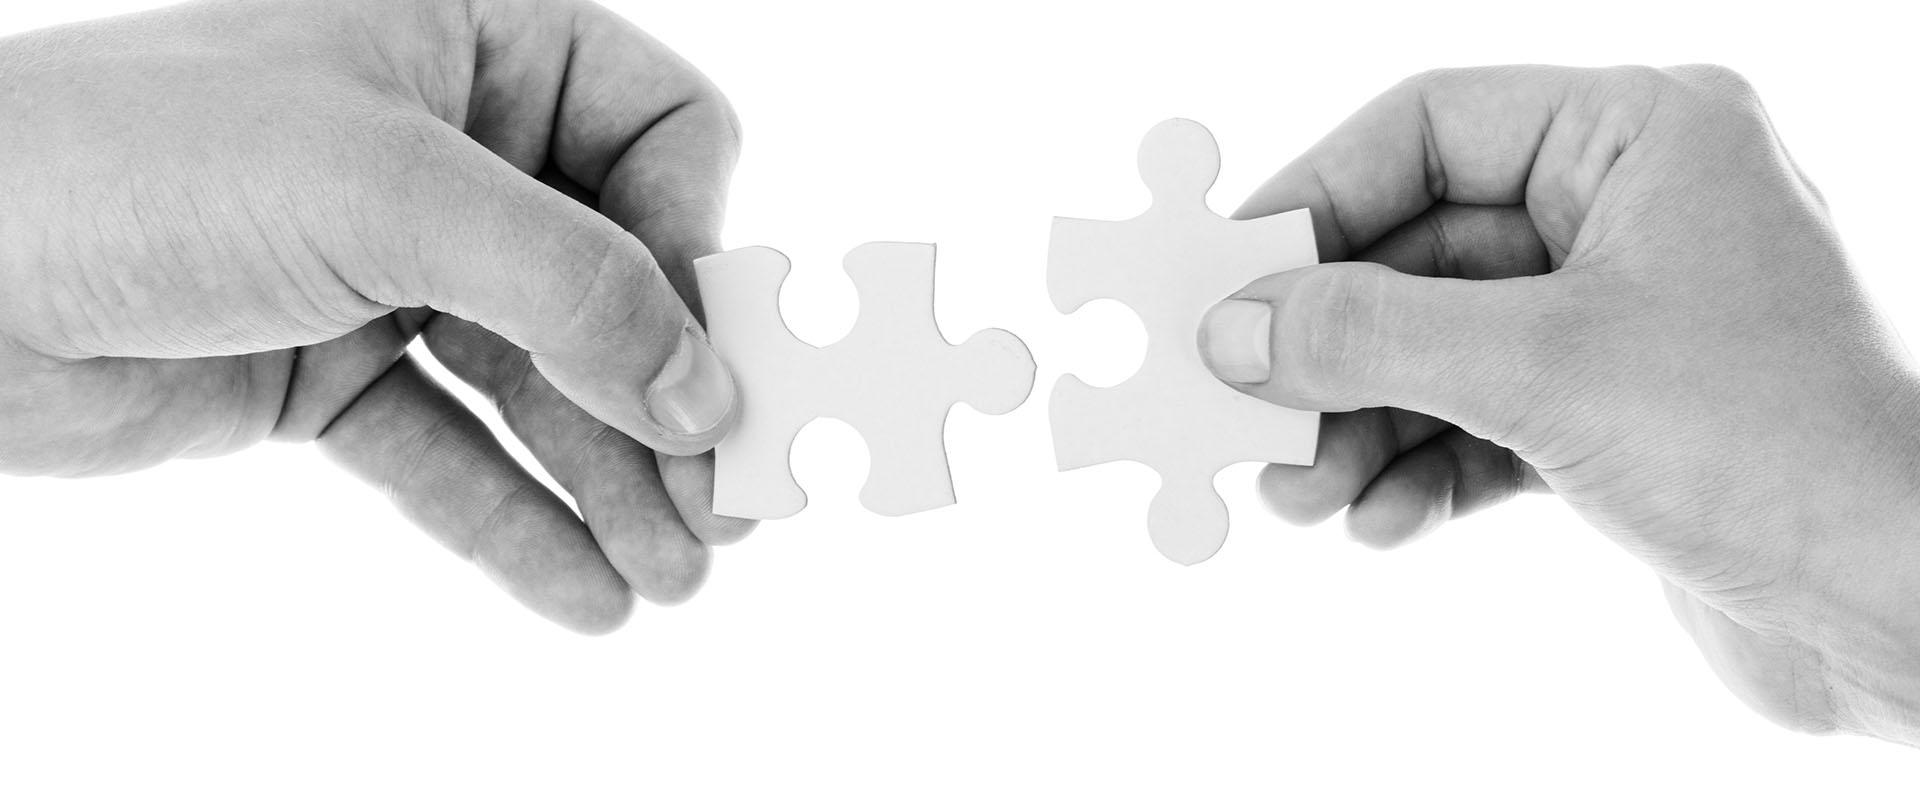 Partnerprogramm Melters und Partner